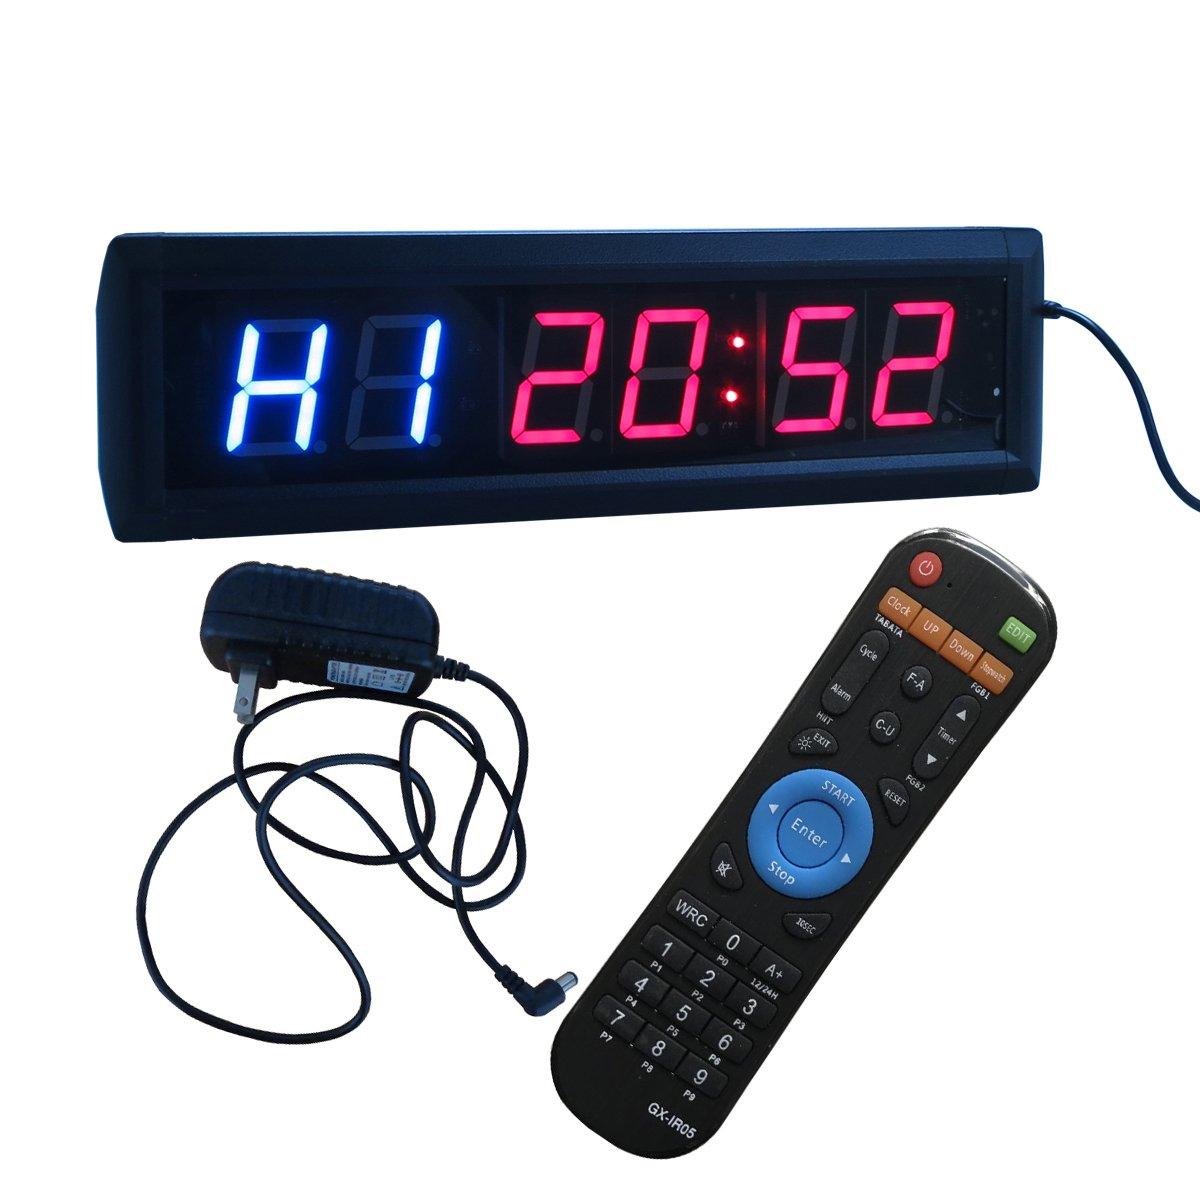 Ledgital Interval Programmable Crossfit Countdown